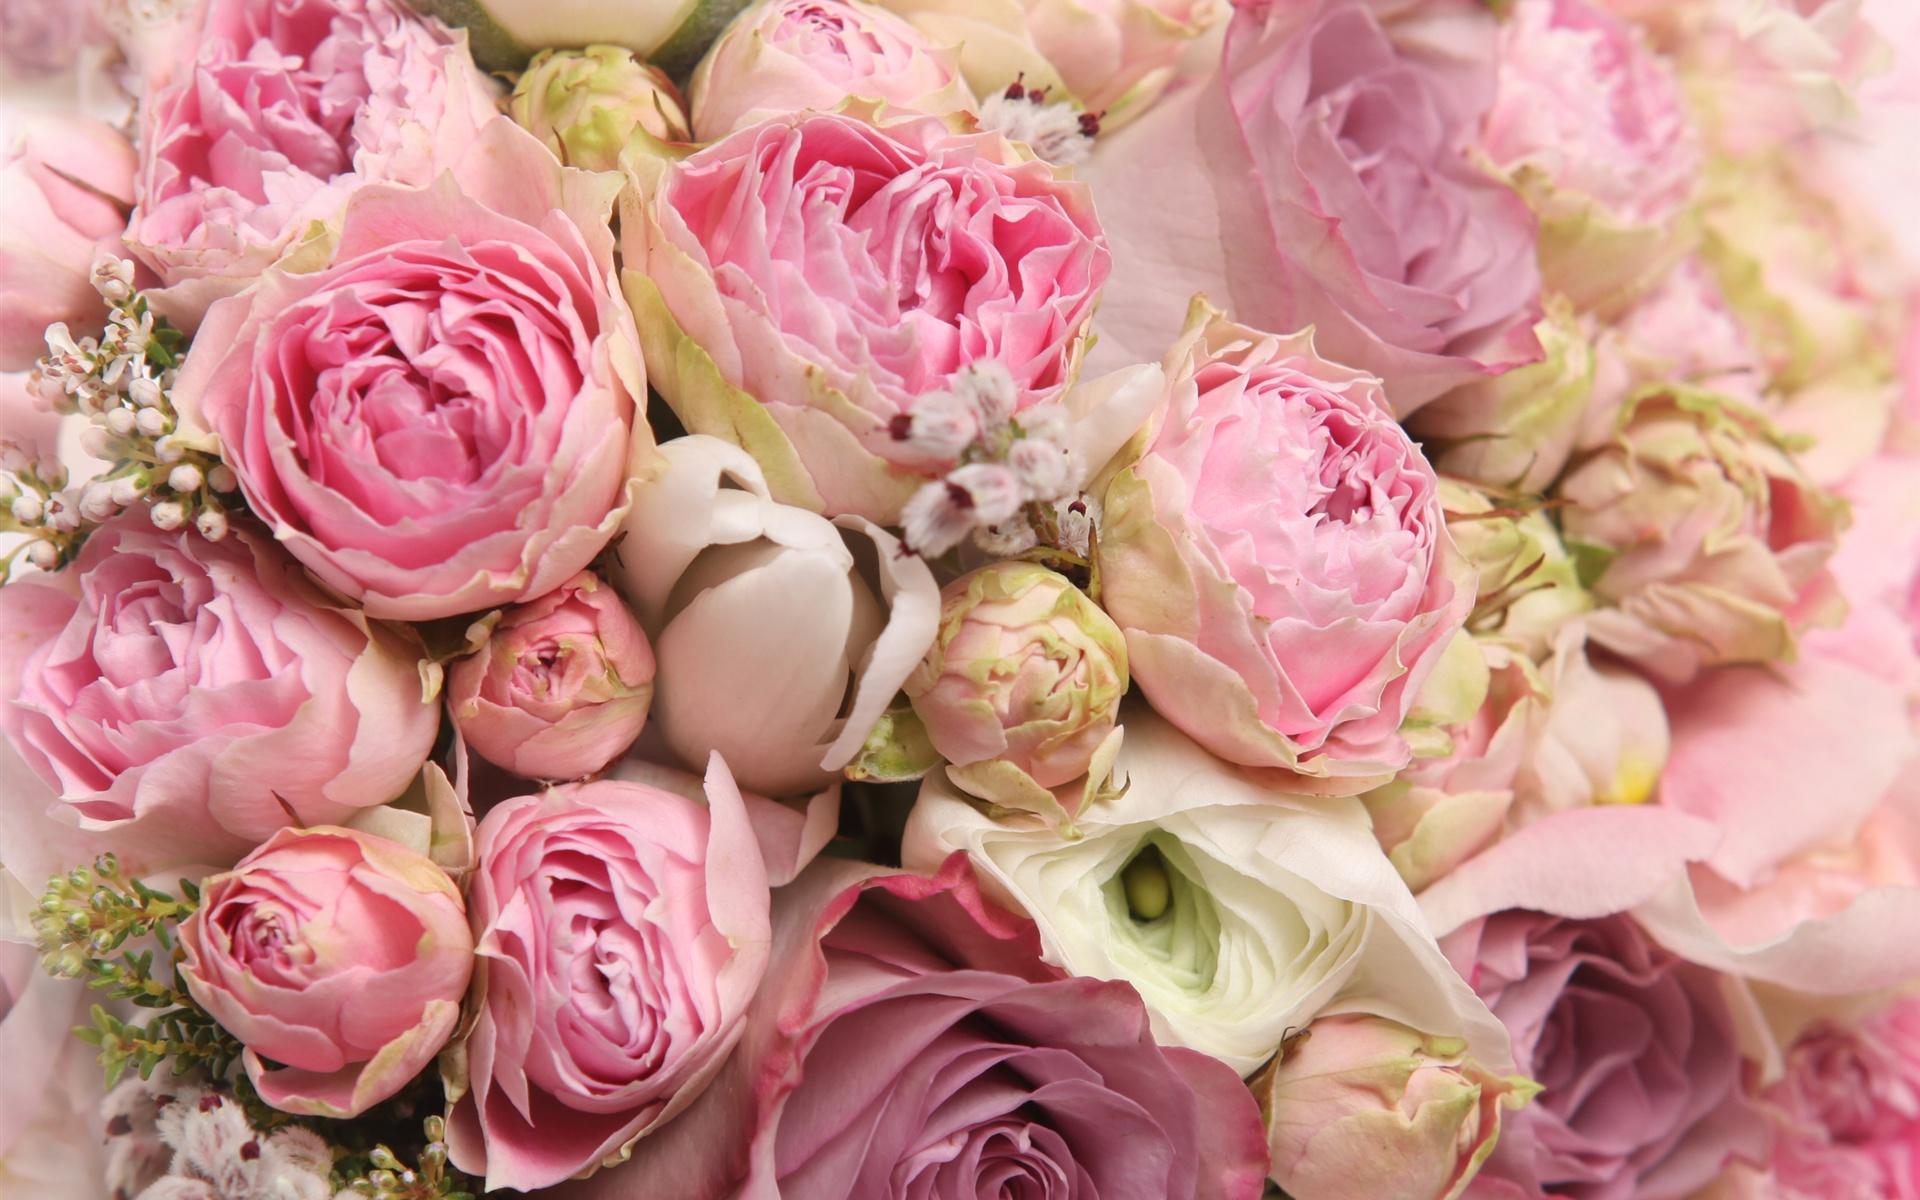 Wall Paper Wide Pink Rose Colours Soft Nature Flower: 壁紙 ピンクの花、美しいバラ、ロマンス 2560x1920 HD 無料のデスクトップの背景, 画像